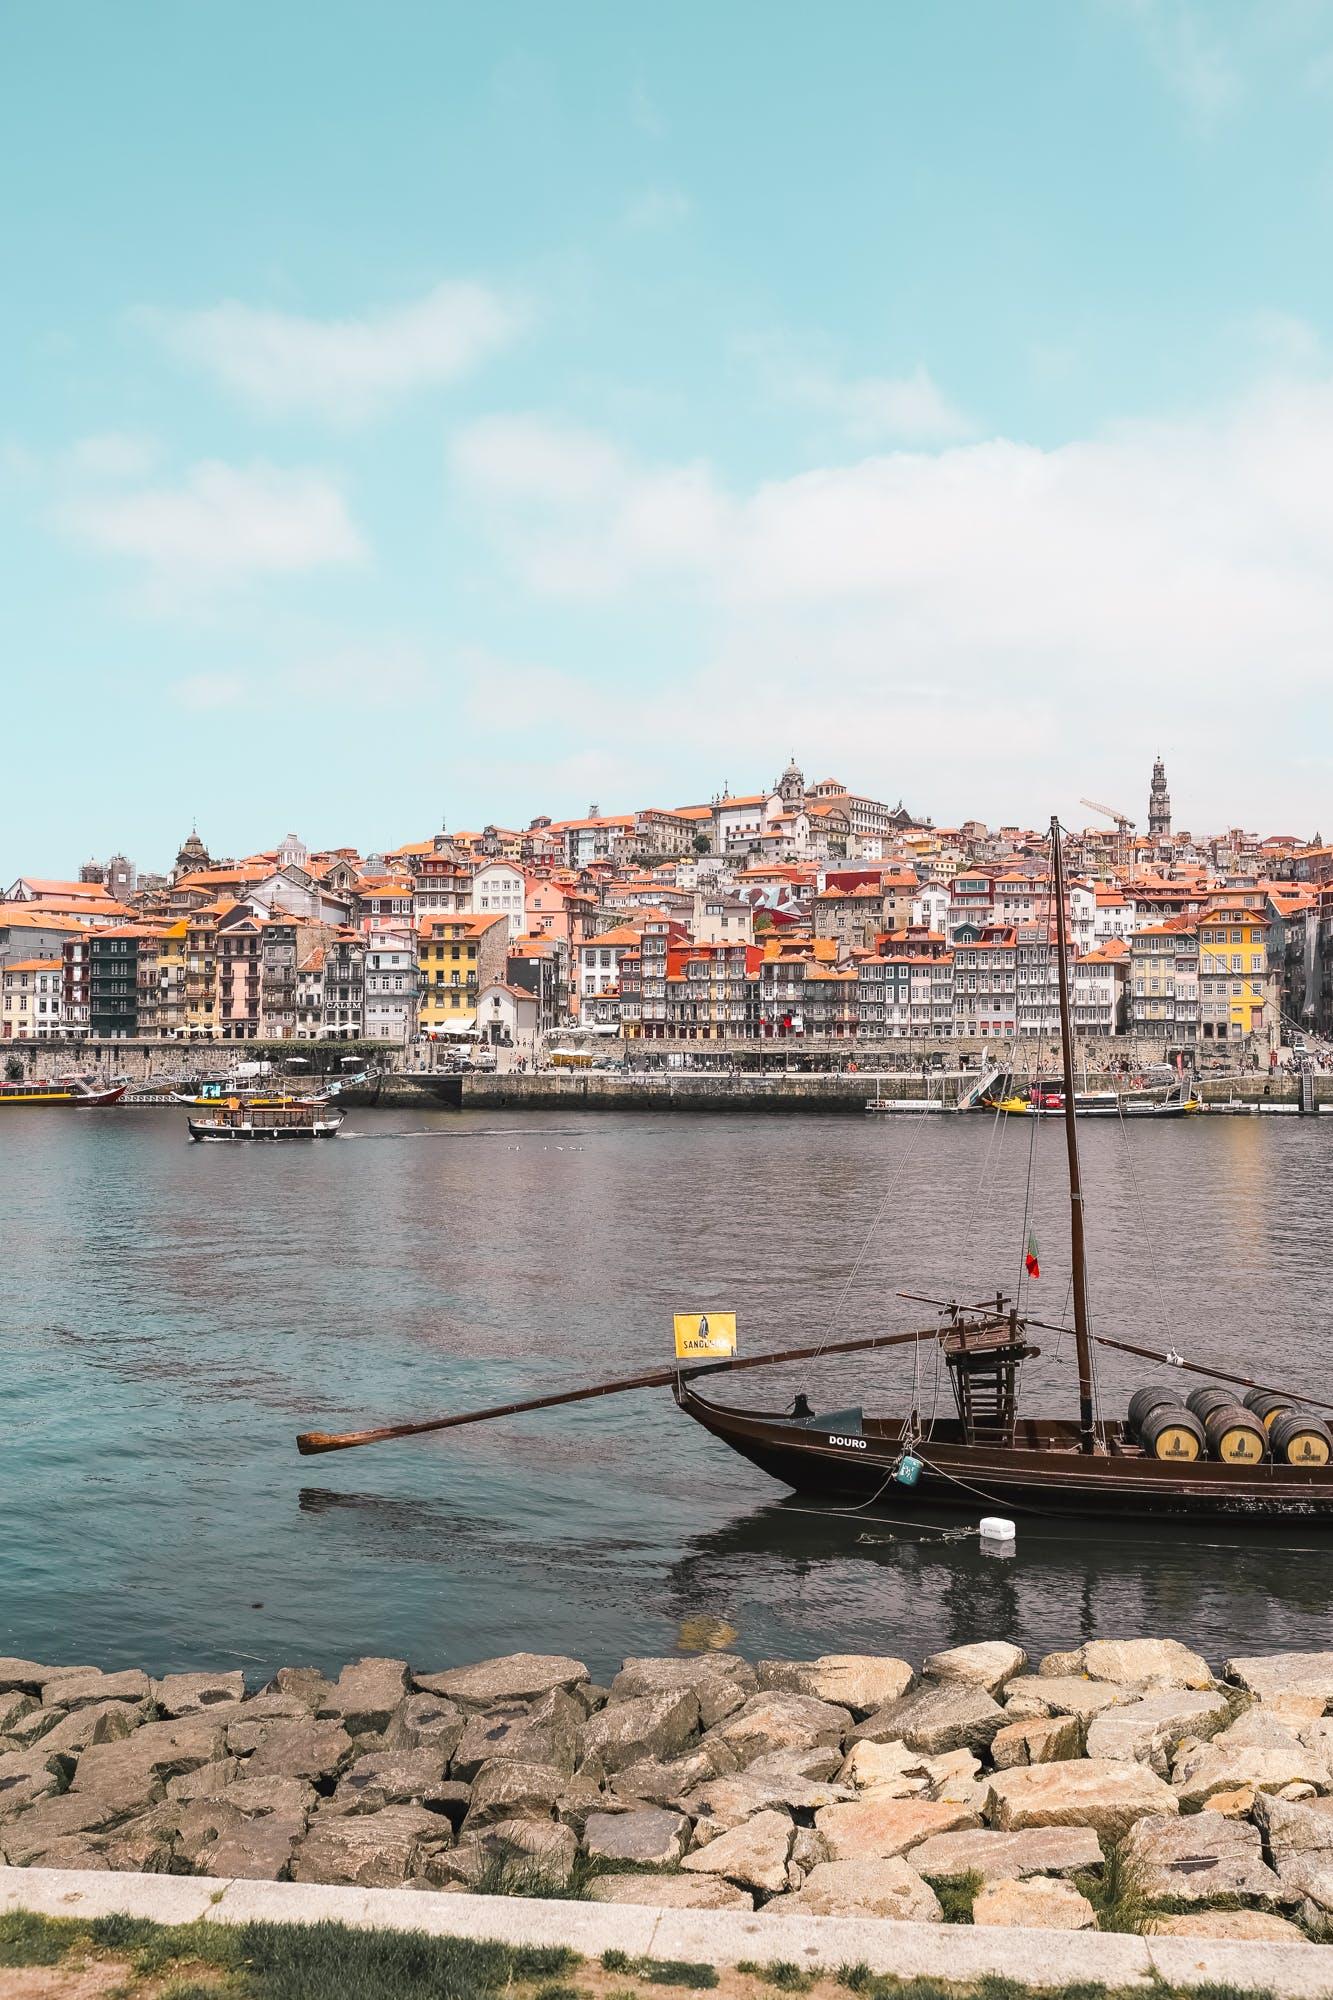 villa nova de gaia porto portugal (1 of 3)